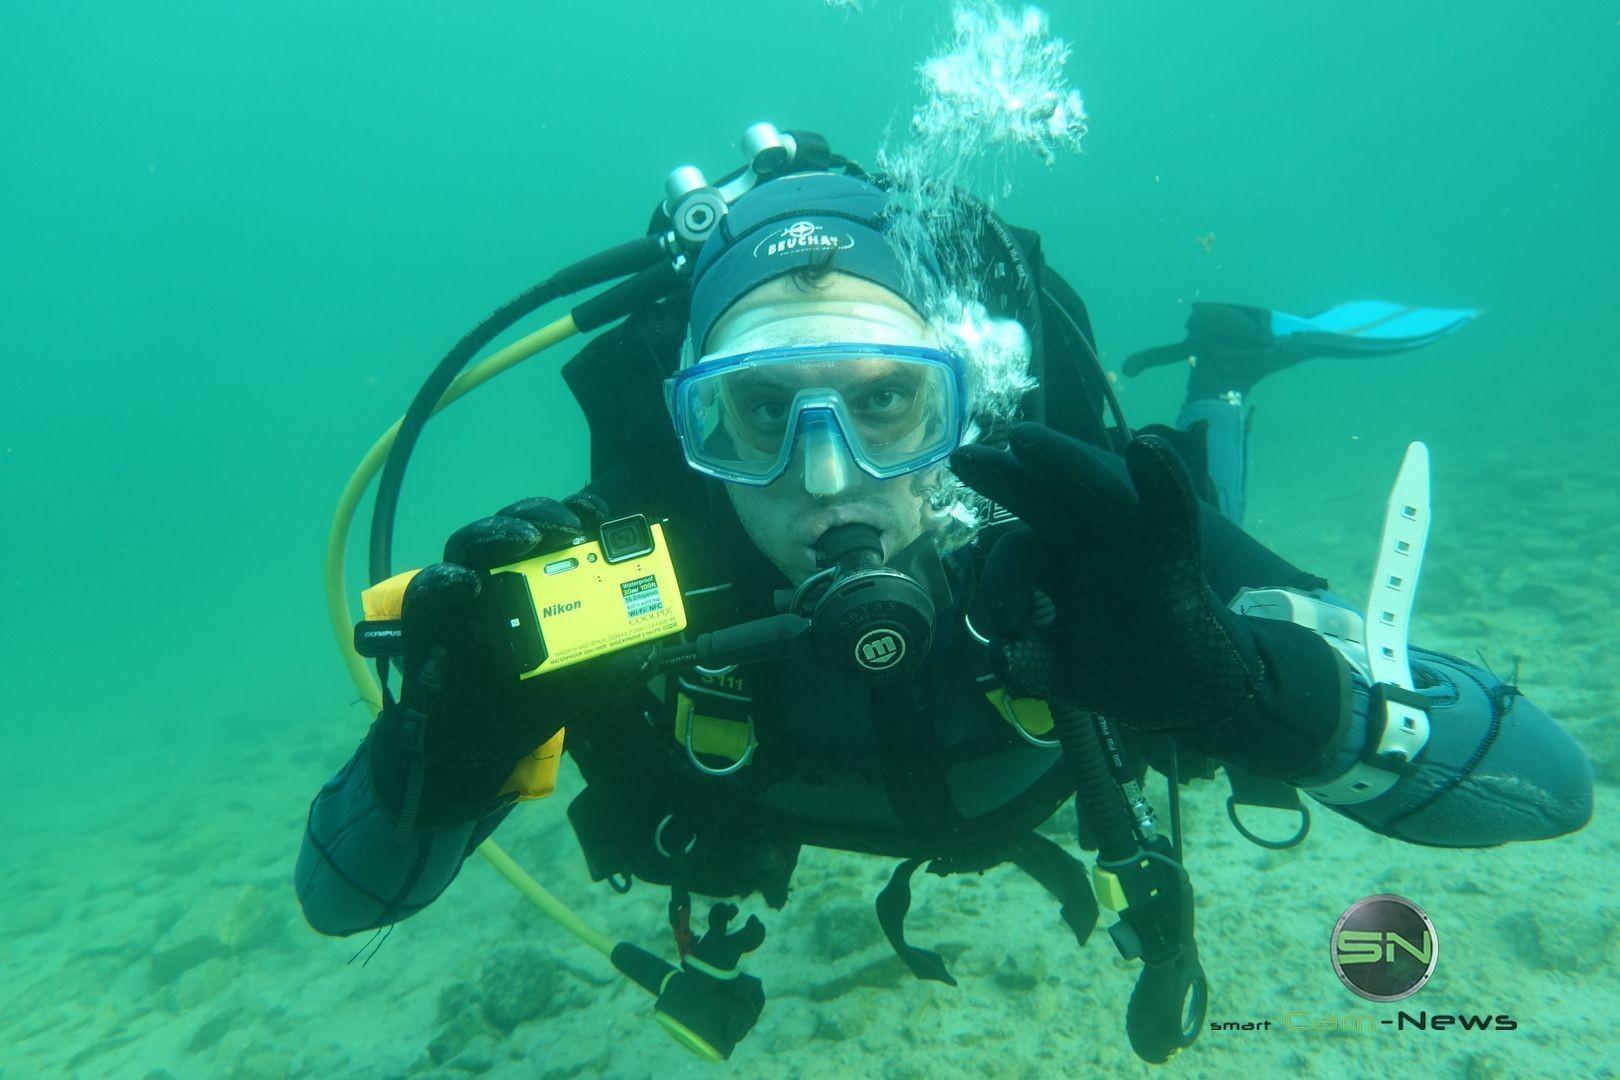 Nikon AW130 Diving Test Achensee Tirol - SmartCamNews